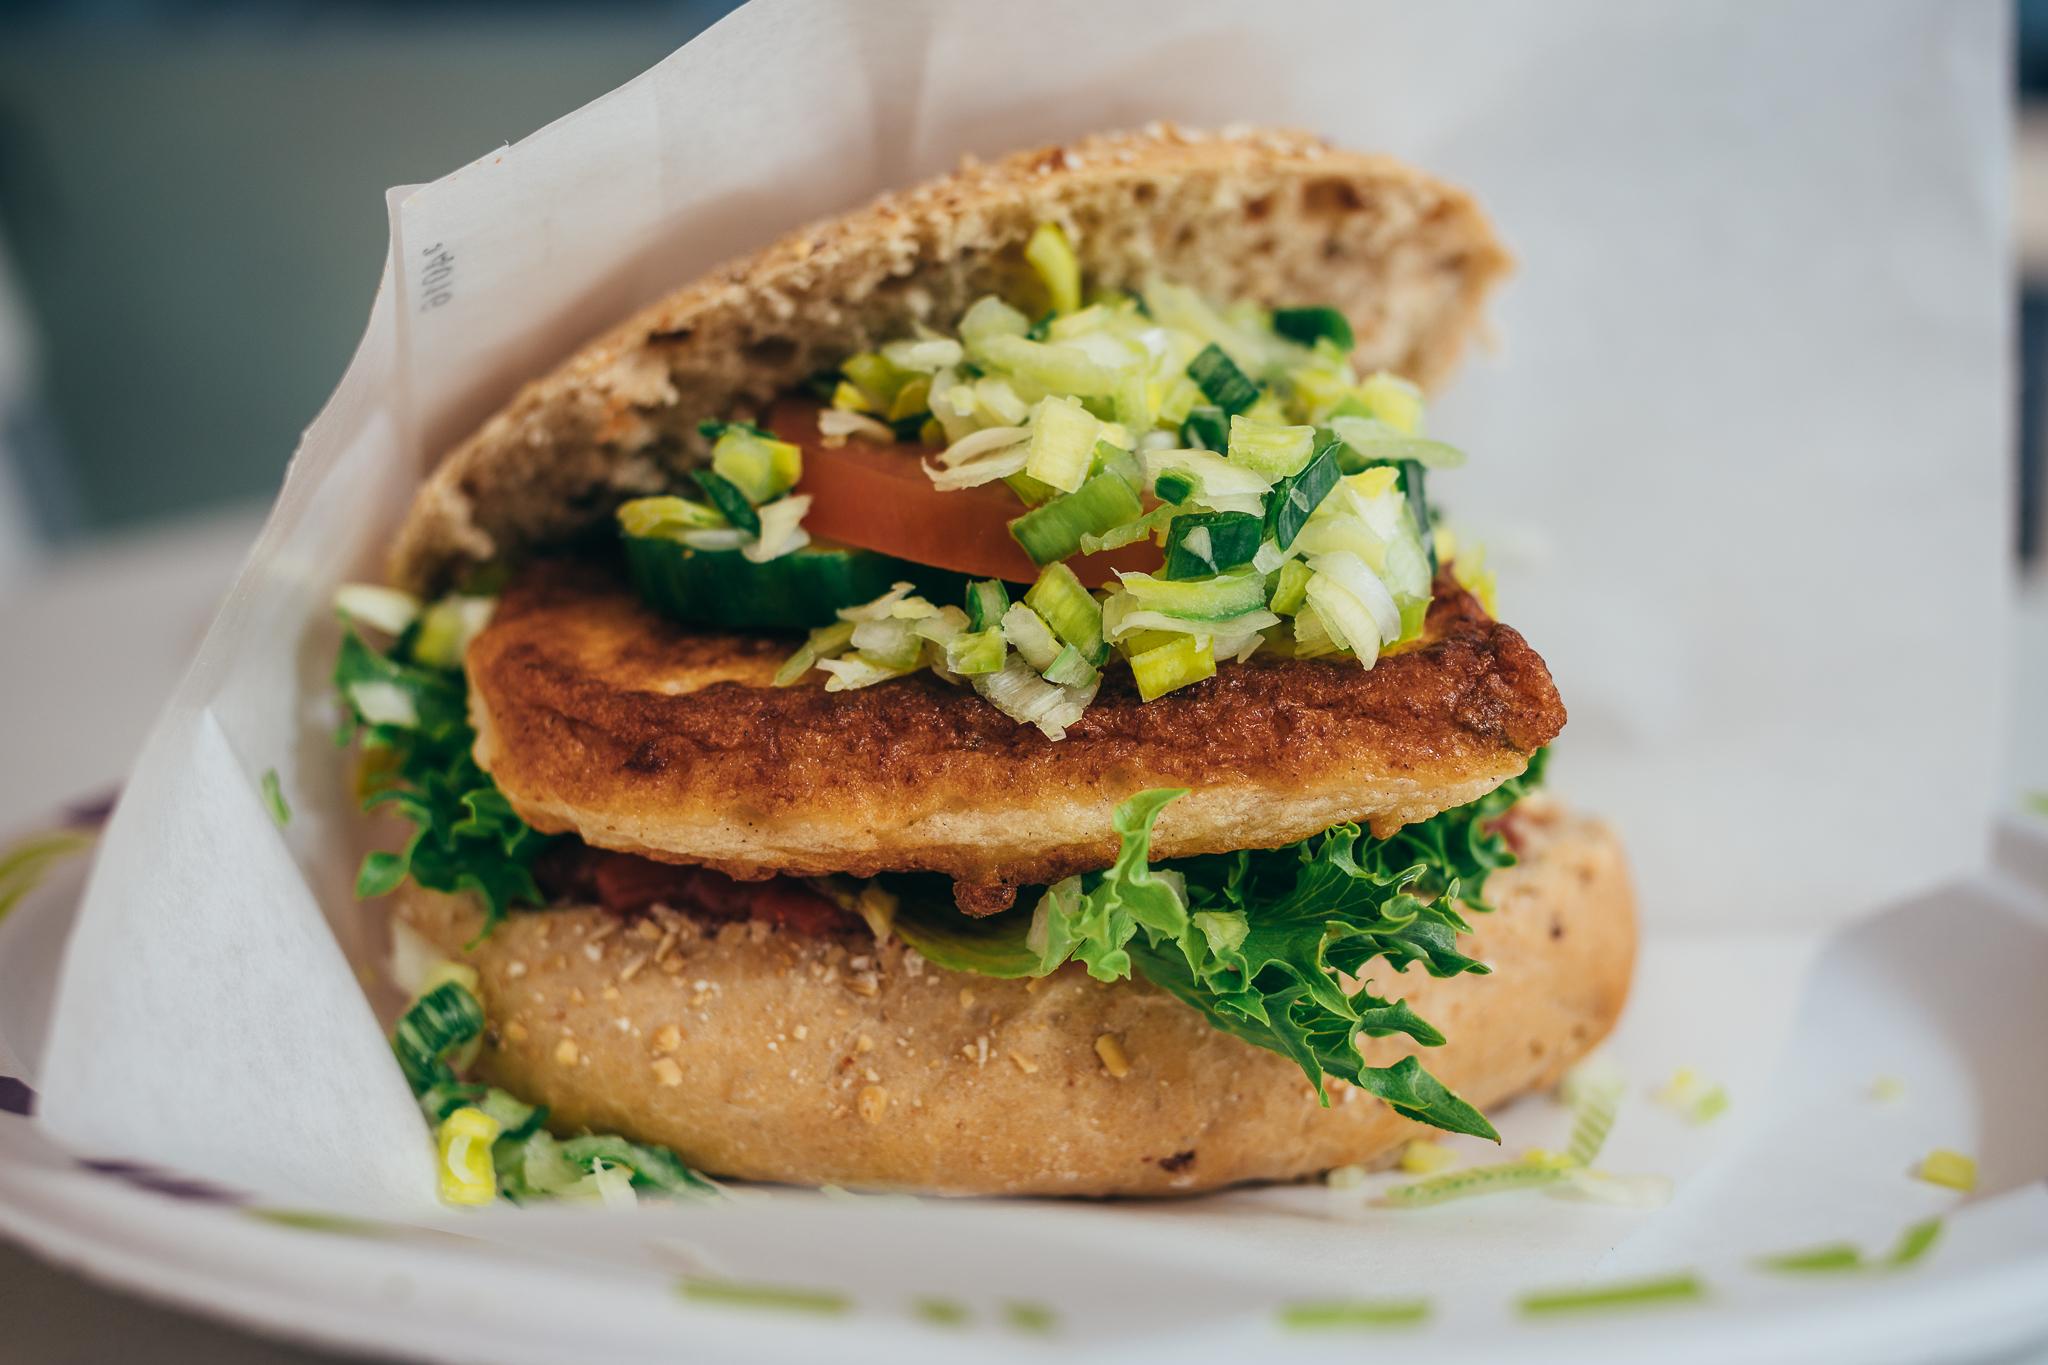 Fiskeburguer, a really tasty fish burger in sauce at Søstrene Hagelin AS